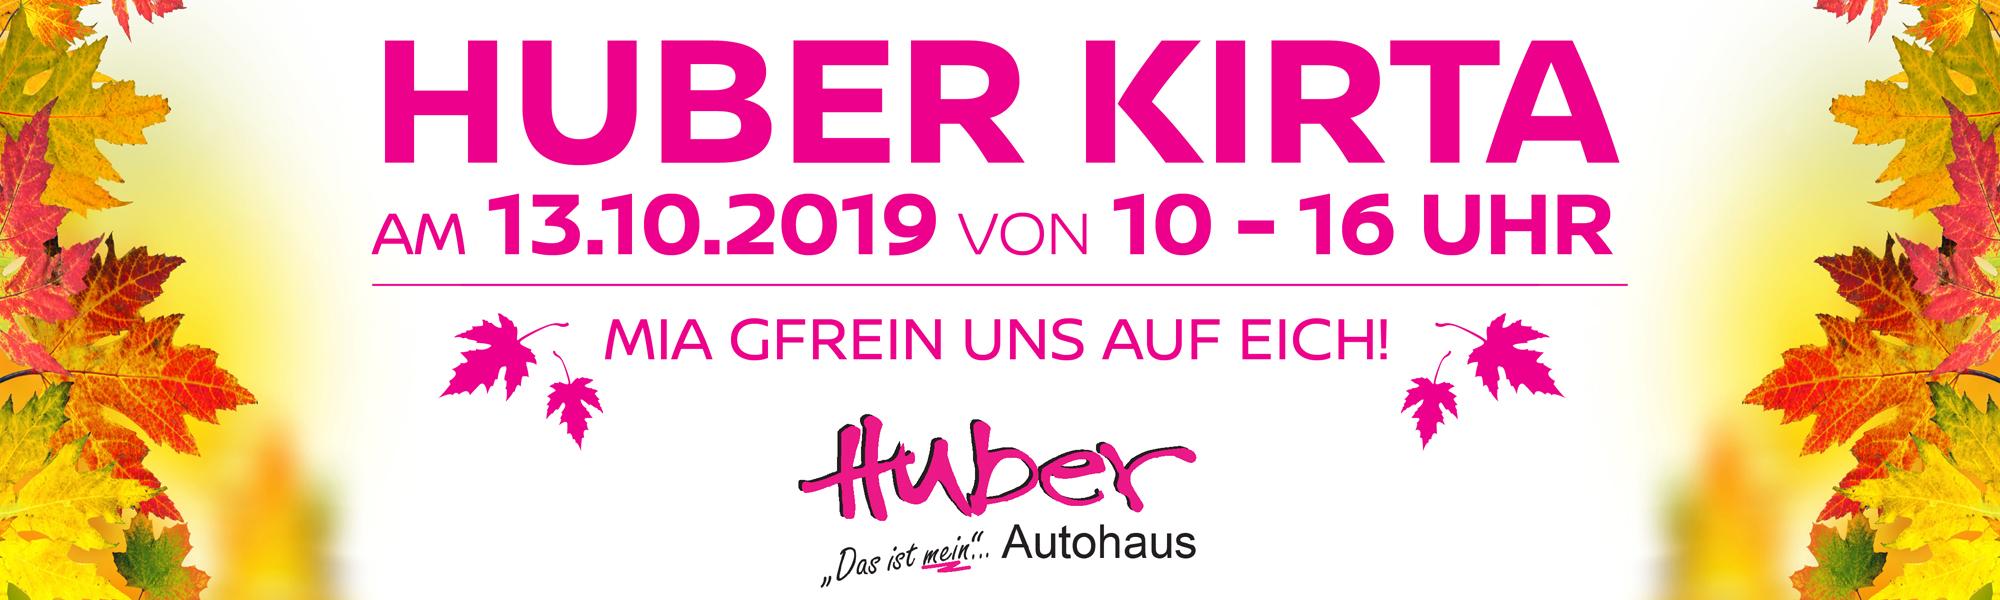 Einladung zum Huber Kirta 2019